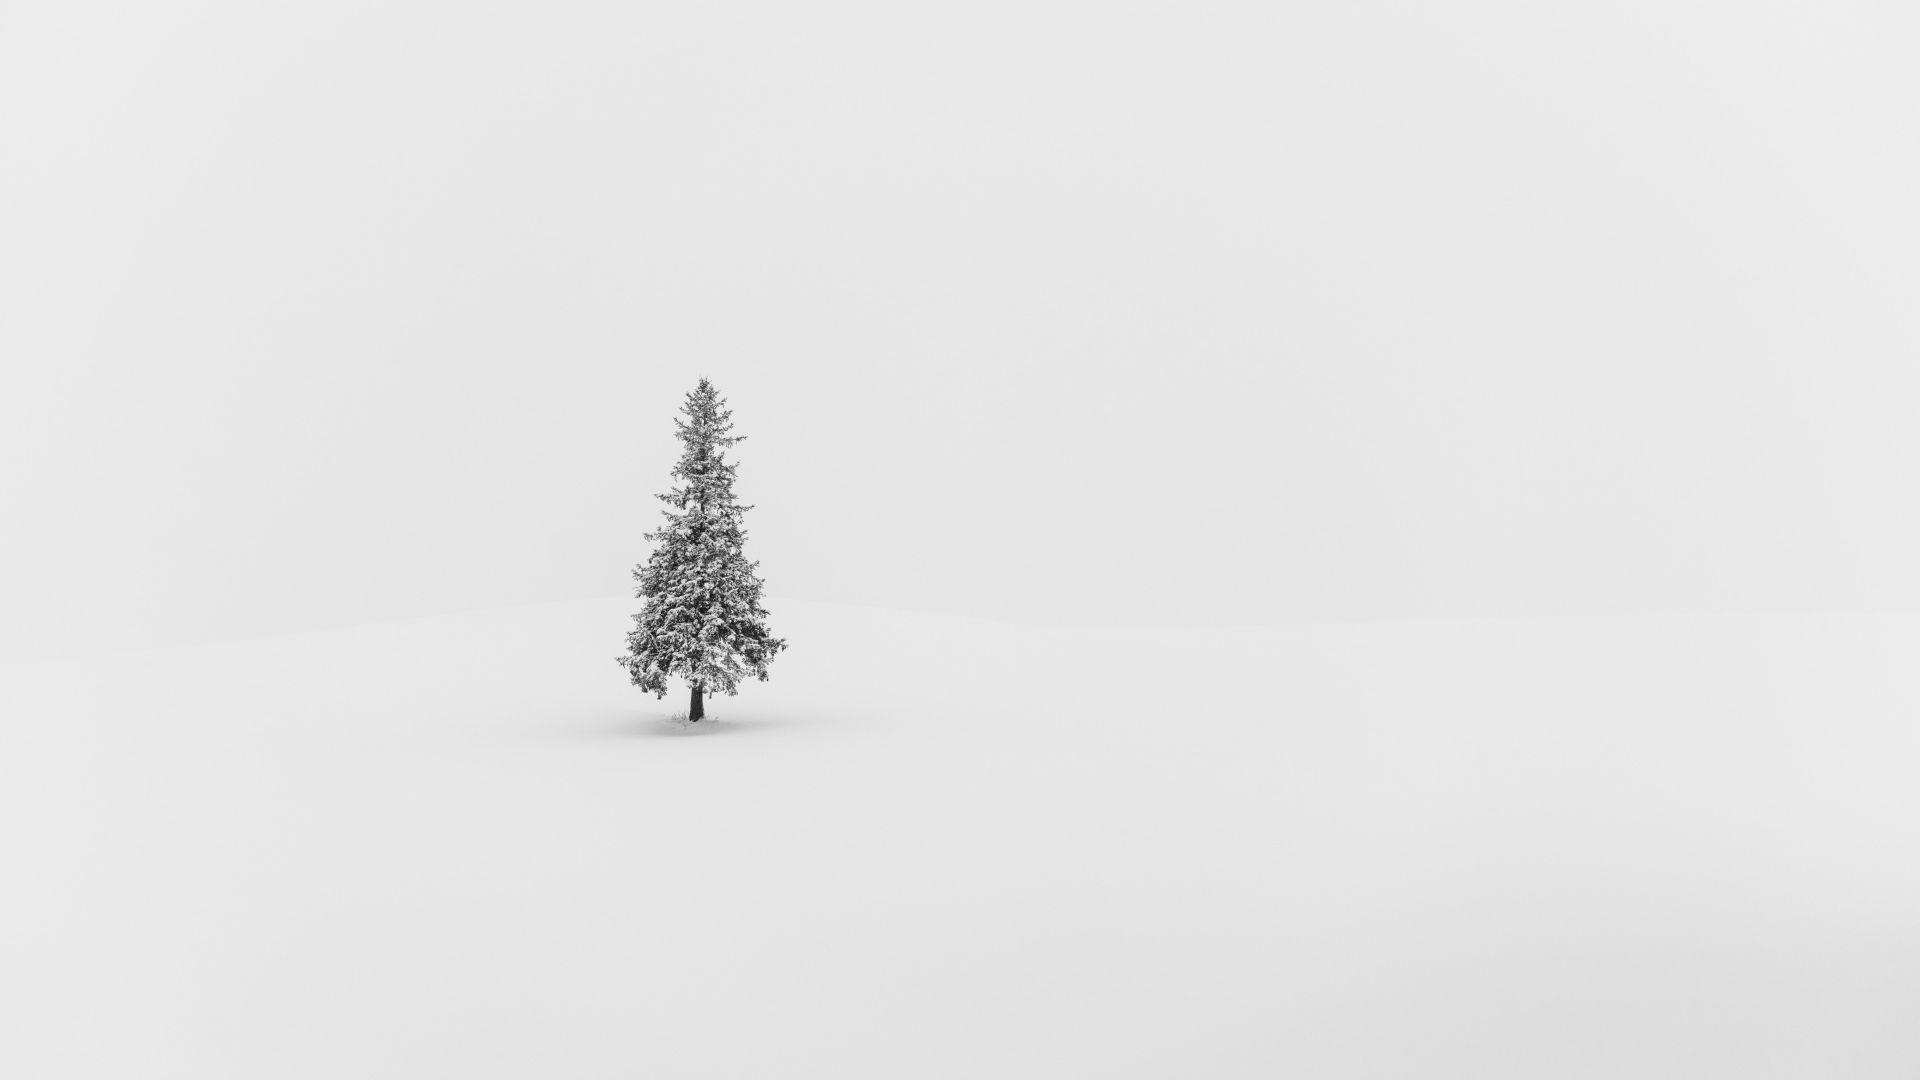 Noel_arbre_seul_dans_la_neige.jpg